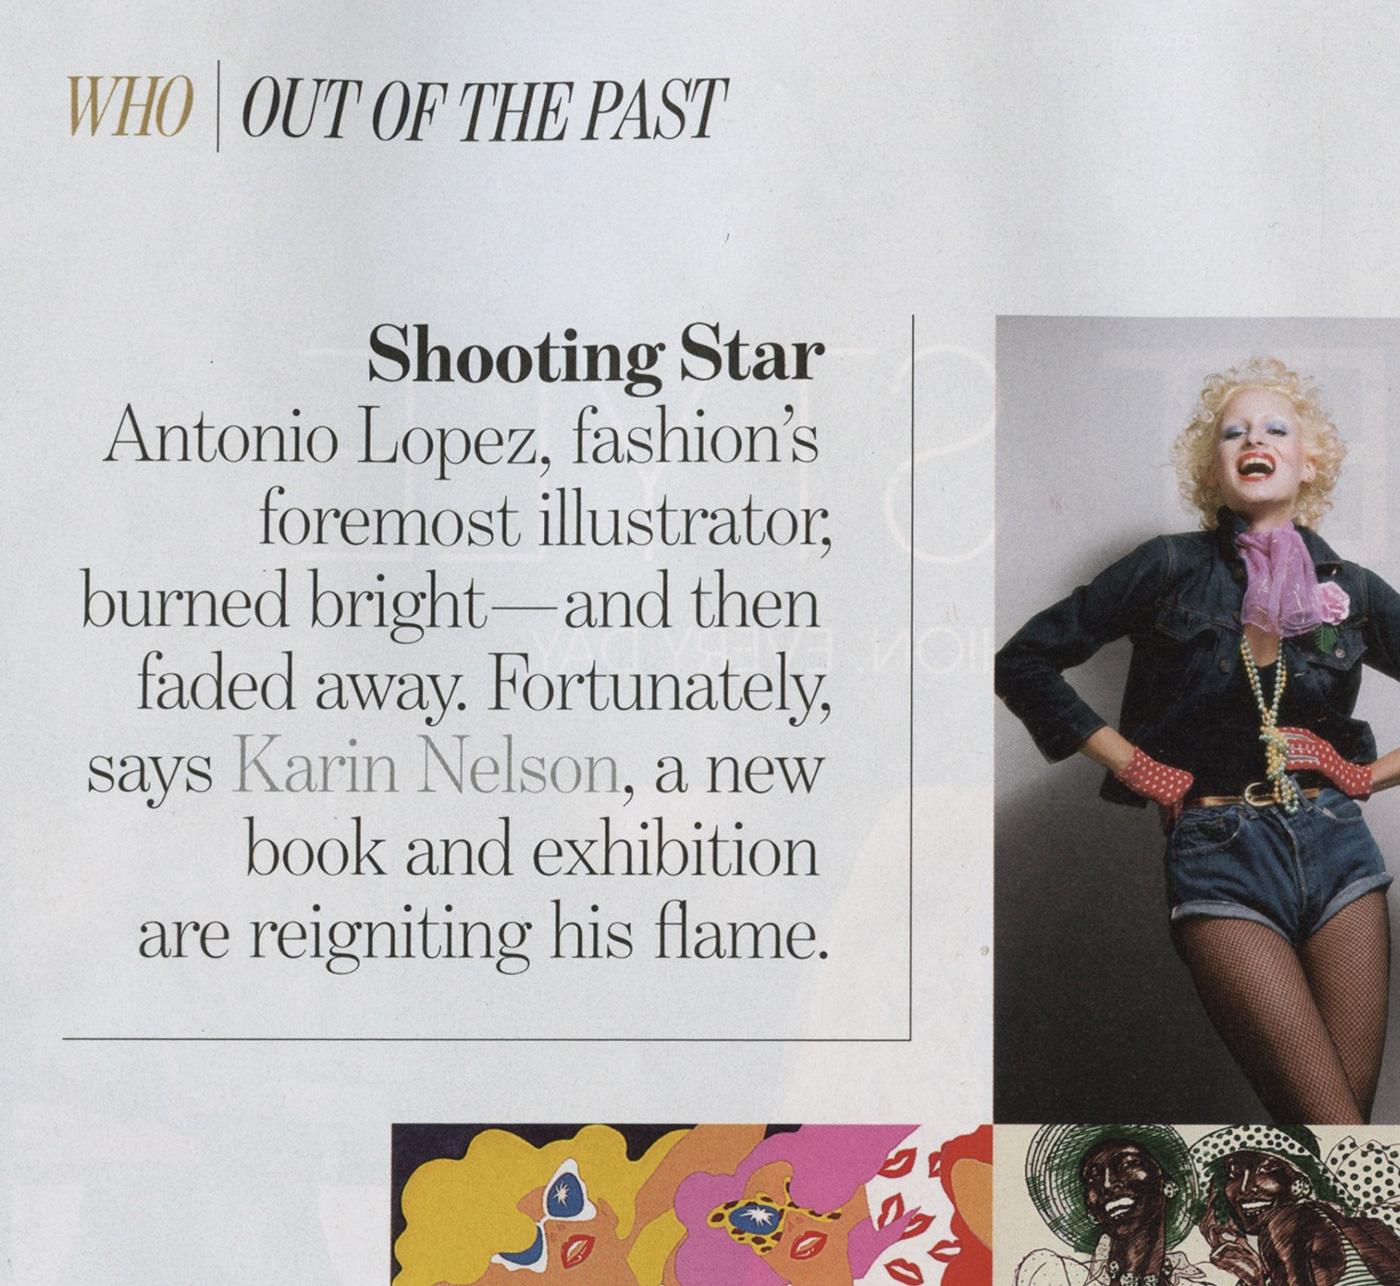 W Magazine, Sept. 2012 - deck